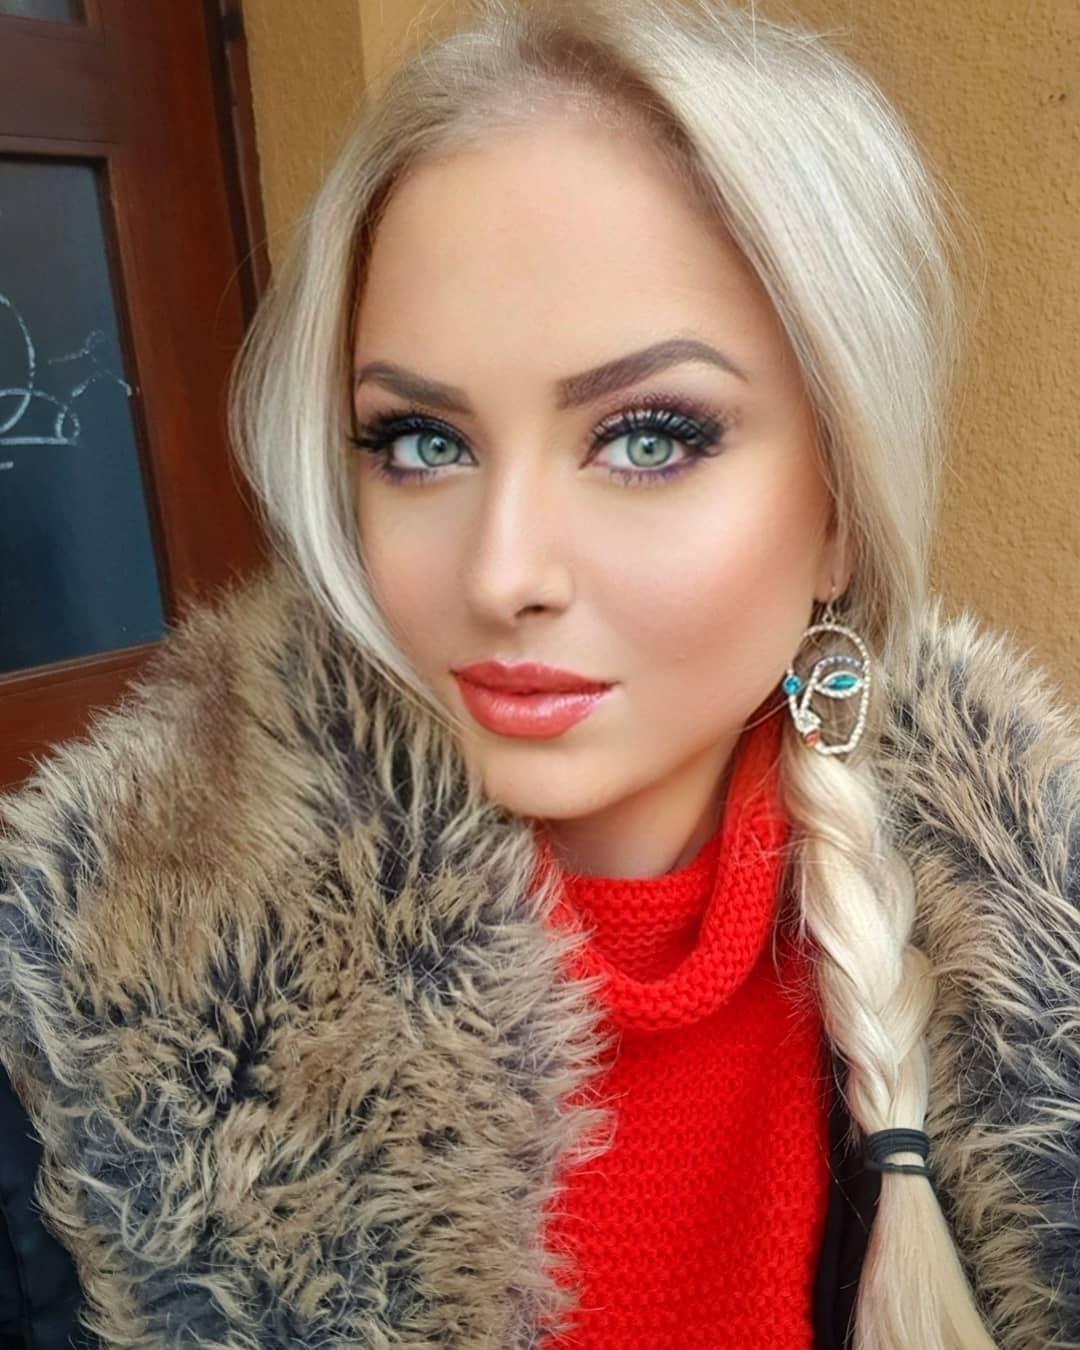 Veronica-Hunkova-Wallpapers-Insta-Fit-Bio-4